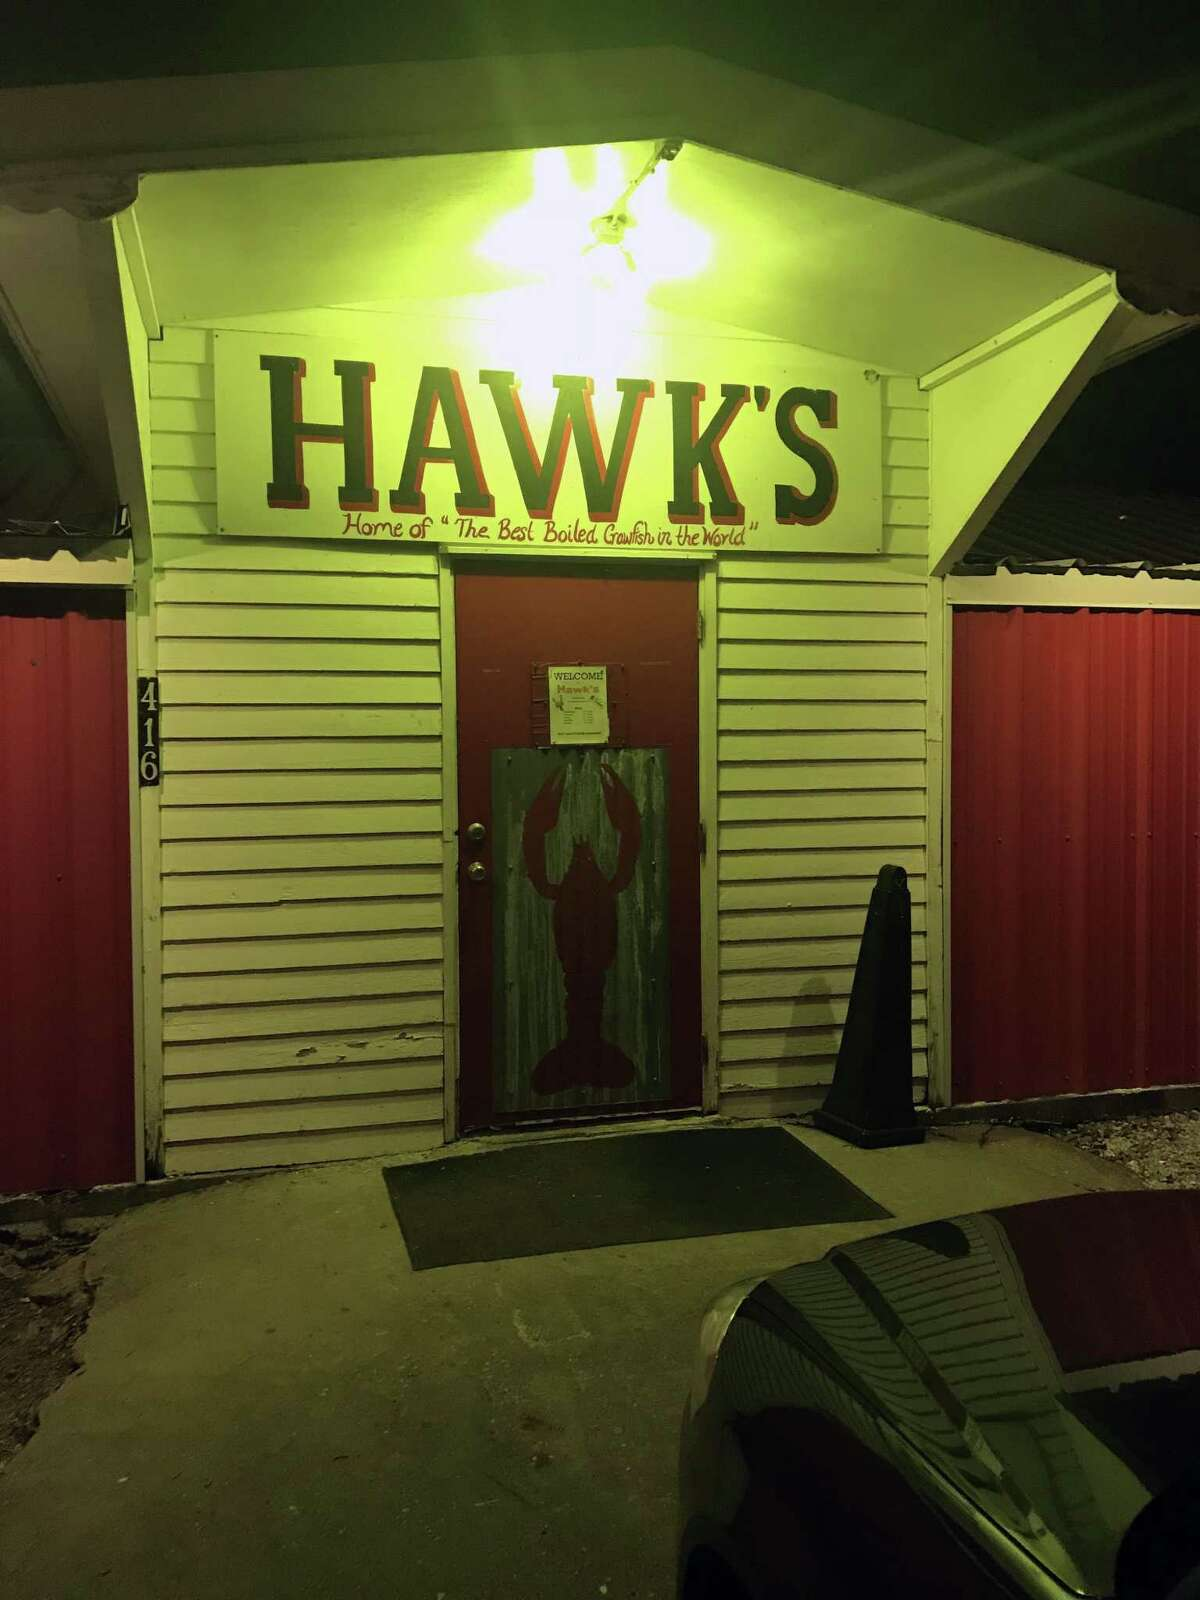 Hawk's restaurant in Rayne, La.